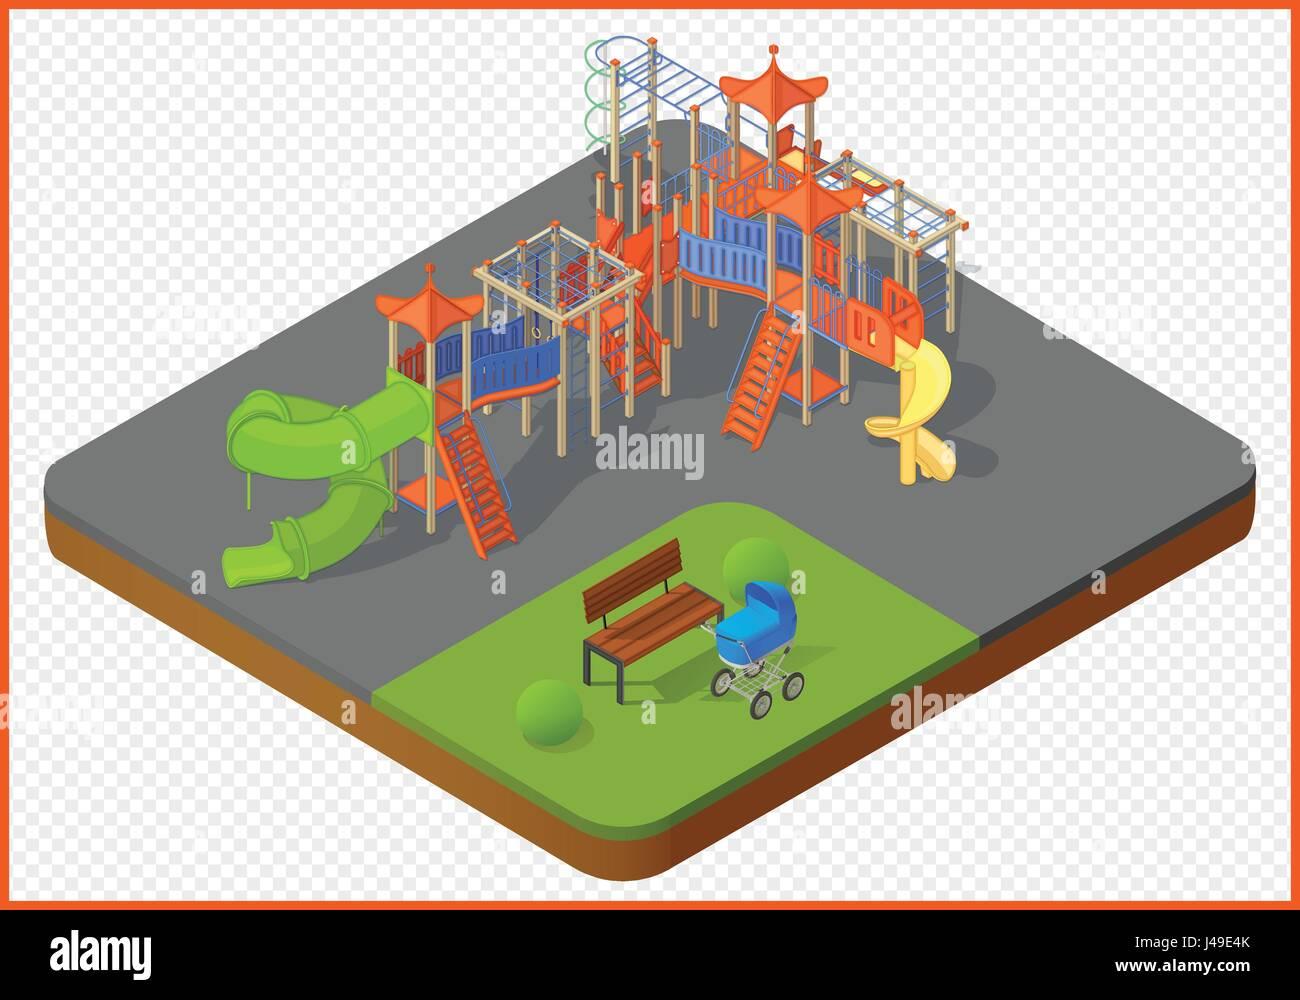 playground vector isometric - Stock Image